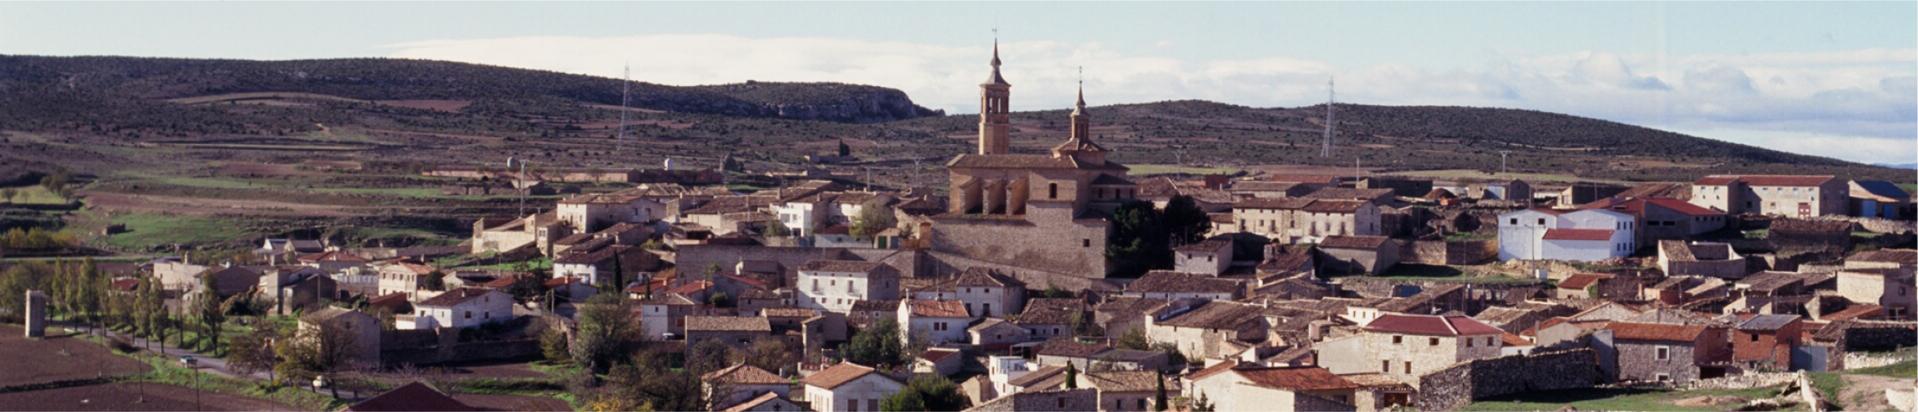 Pueblo - Mejor jamón de Teruel